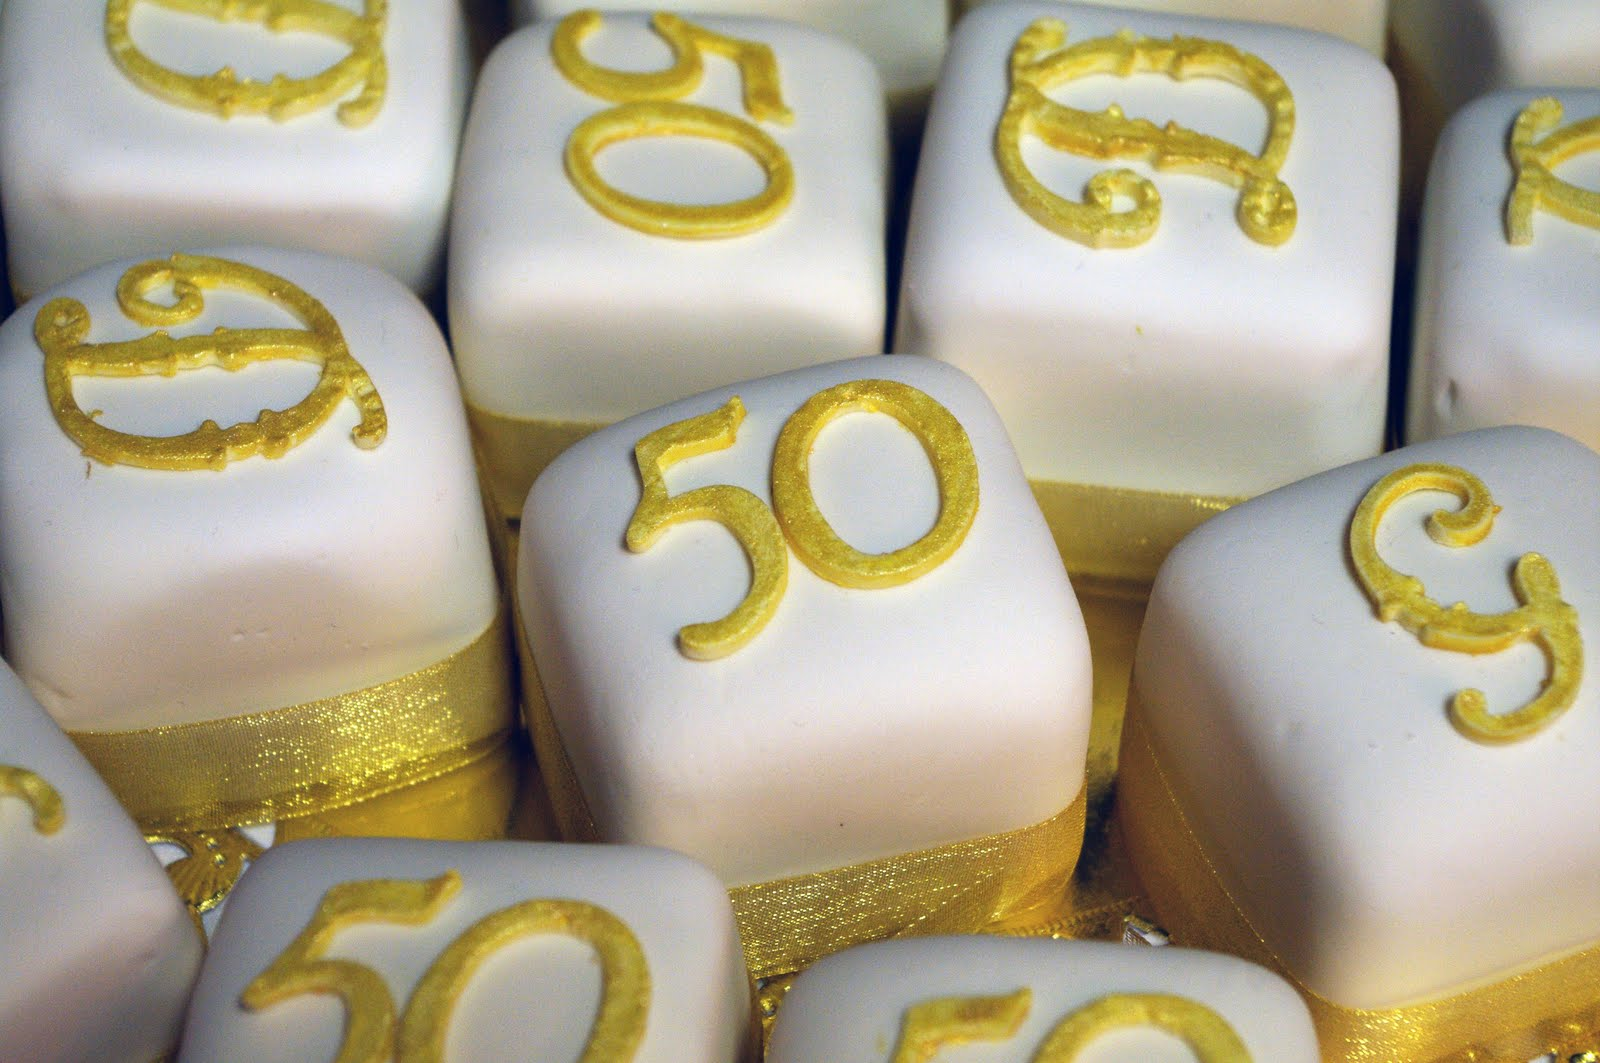 Cricut Cake - 50th Anniversary